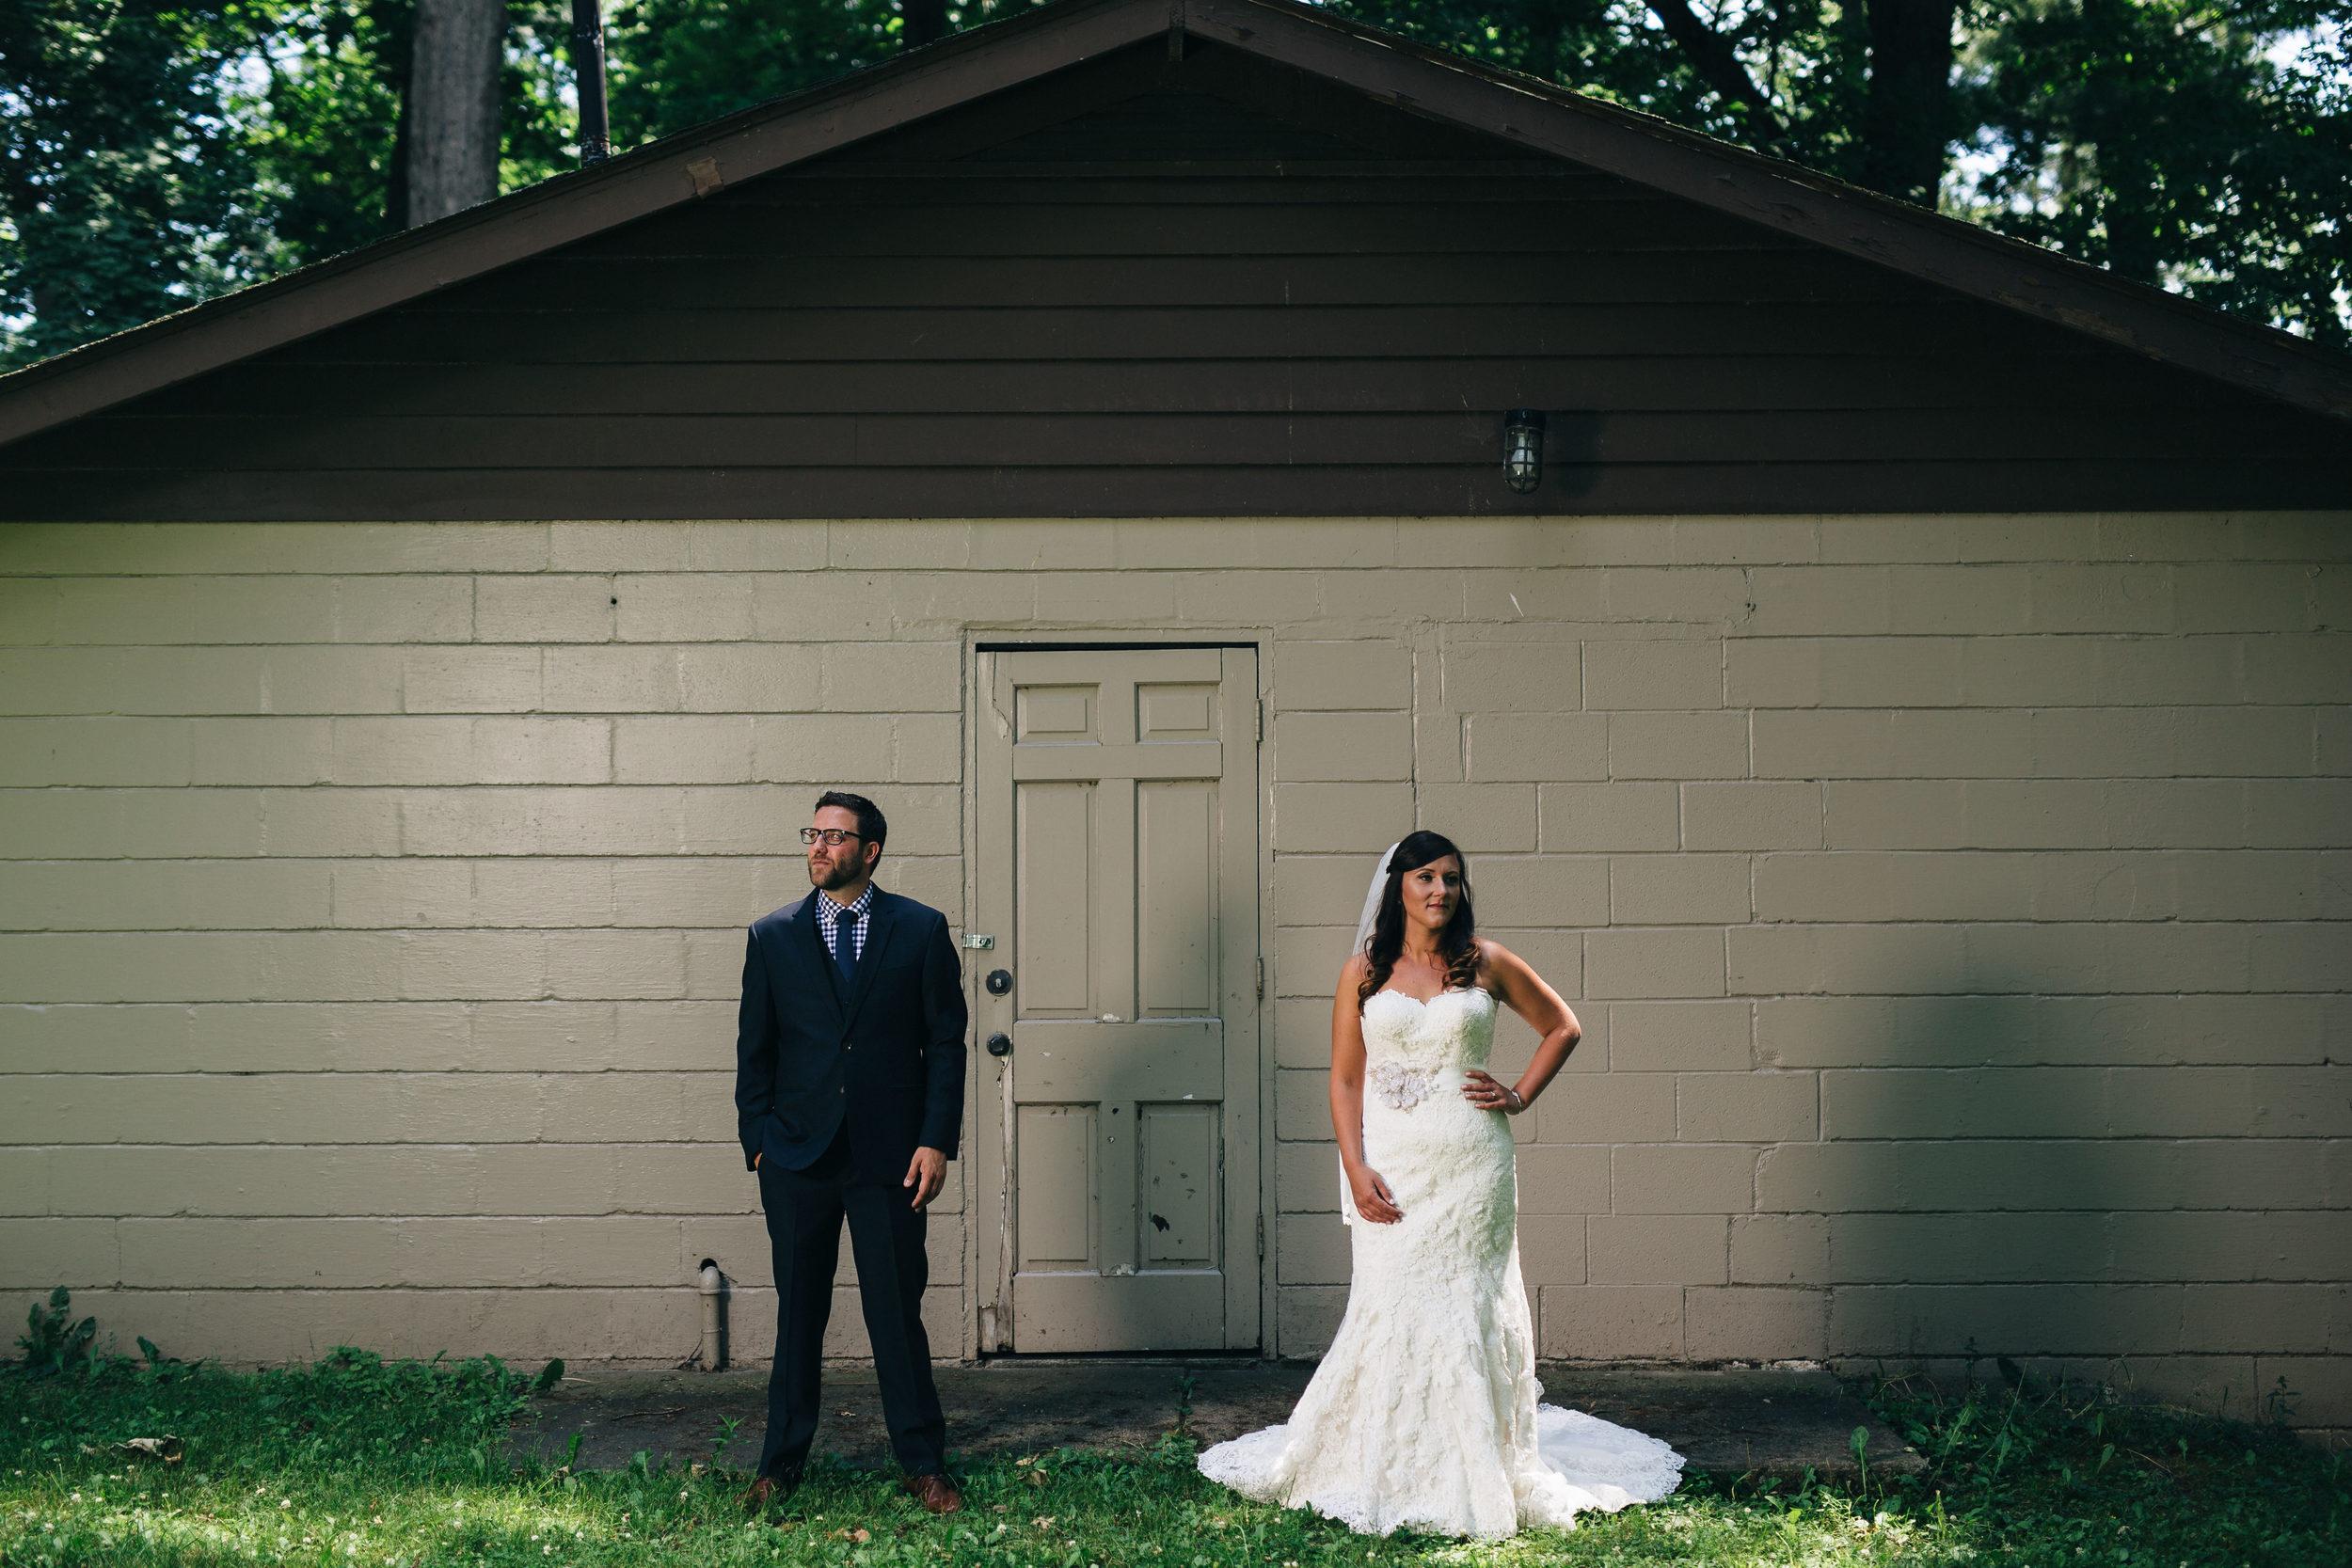 Wedding photography at Hoover park at Walsh University.